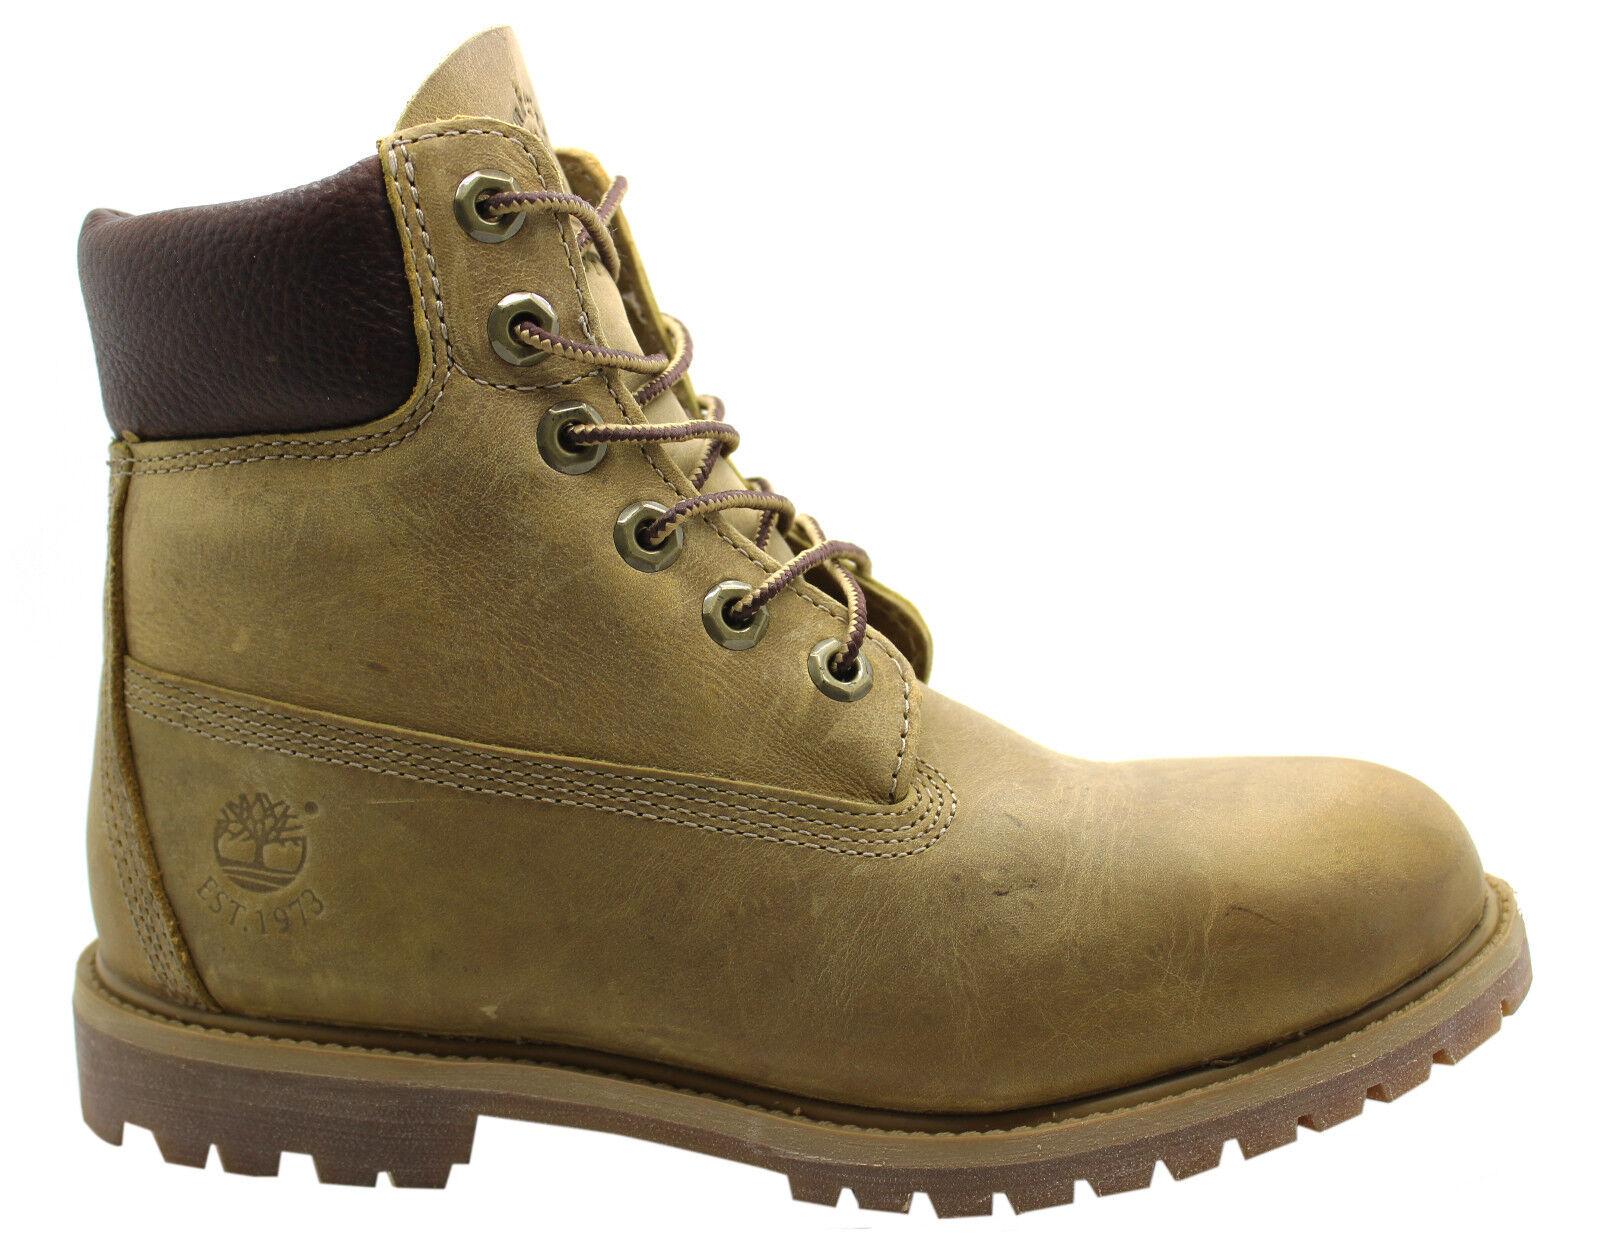 NEU TIMBERLAND Schuhe Damen Earthkeepers Premium 6 27377